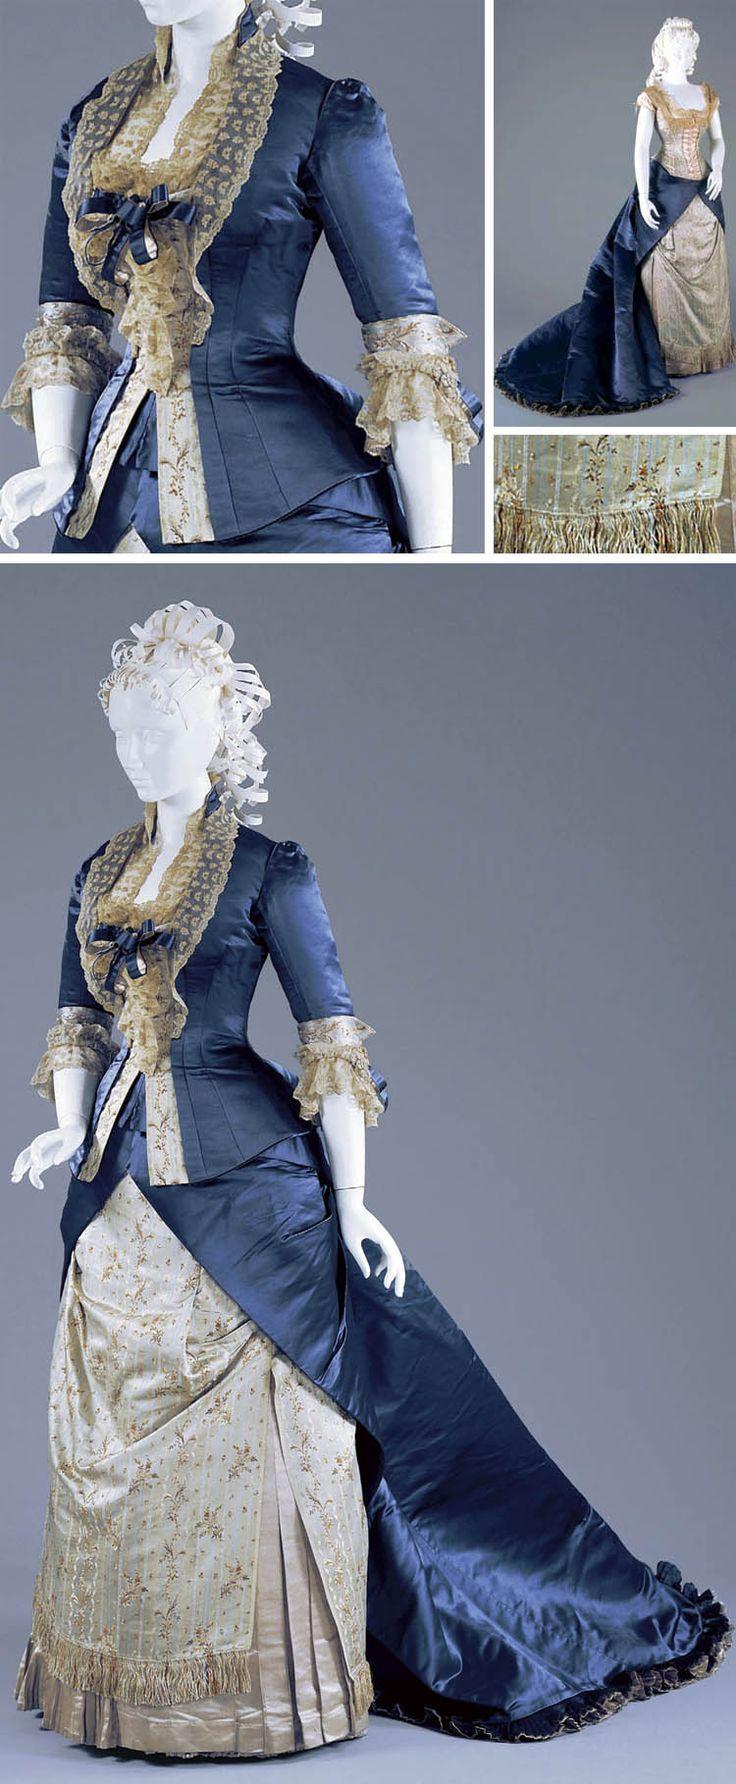 Reception gown, Worth, ca. 1877-78. Cincinnati Art Museum and Cincinnati Art Museum via AEQAI